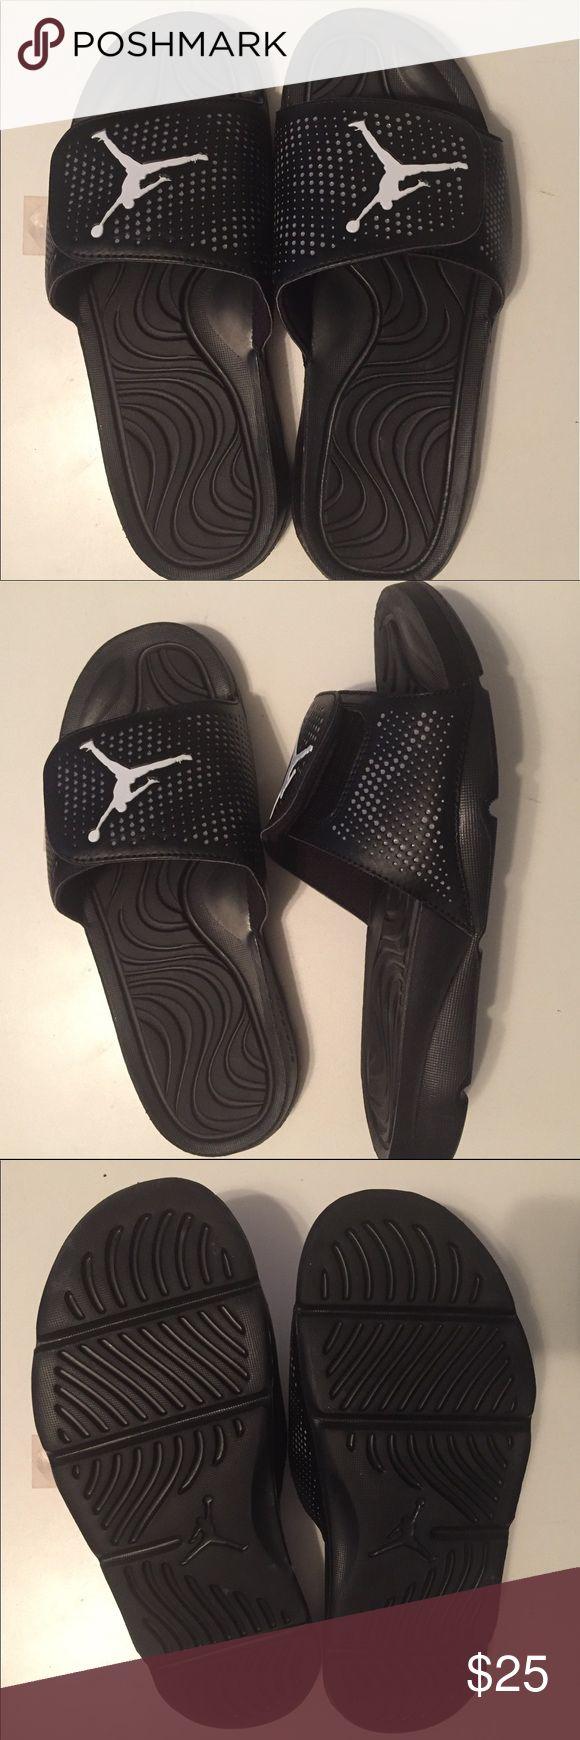 Jordan men's Hydro 5 slide. Size 10. Brand new Jordan men's Hydro 5 slide / sandal. Size 10. Grey/White/Black. Brand new-never worn. Jordan Shoes Sandals & Flip-Flops